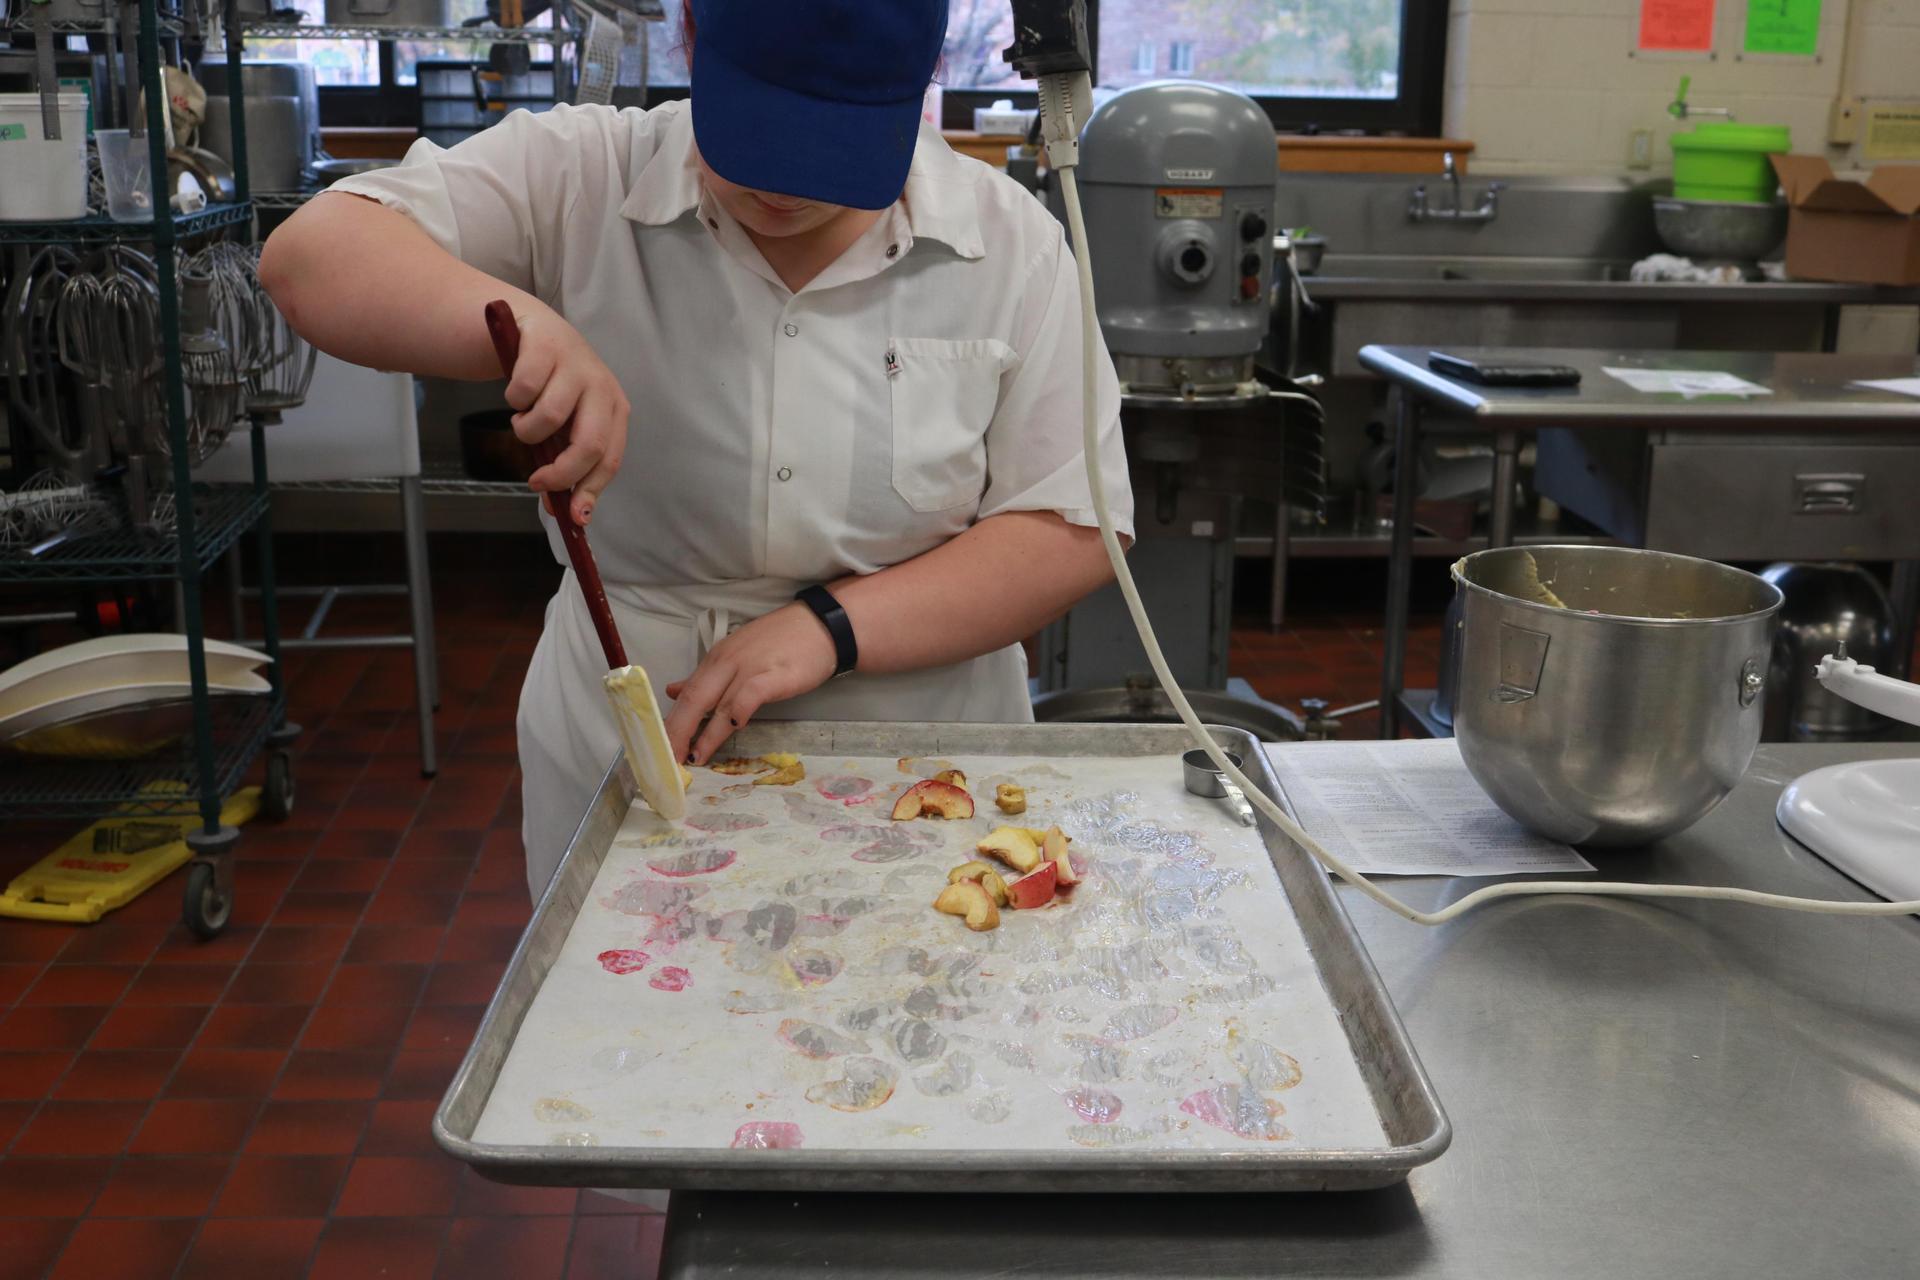 Student working on food preparation